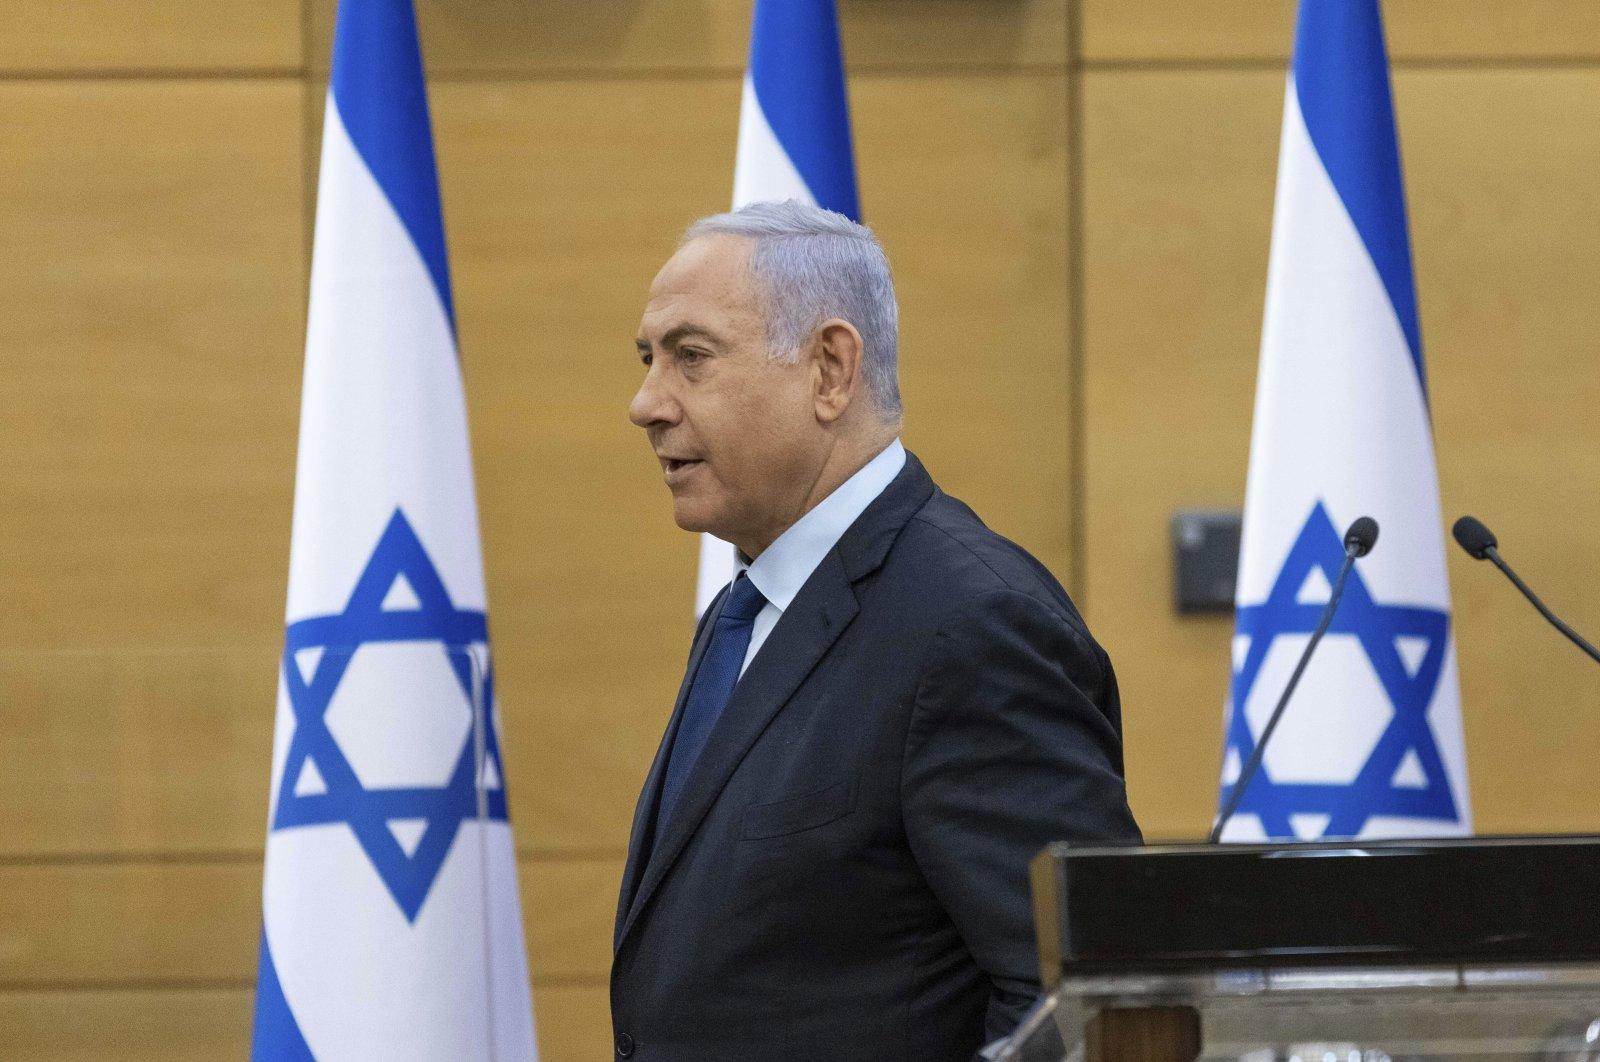 Israeli Prime Minister Benjamin Netanyahu speaks to the Israeli Parliament in Jerusalem, May 30, 2021. (AP Photo)